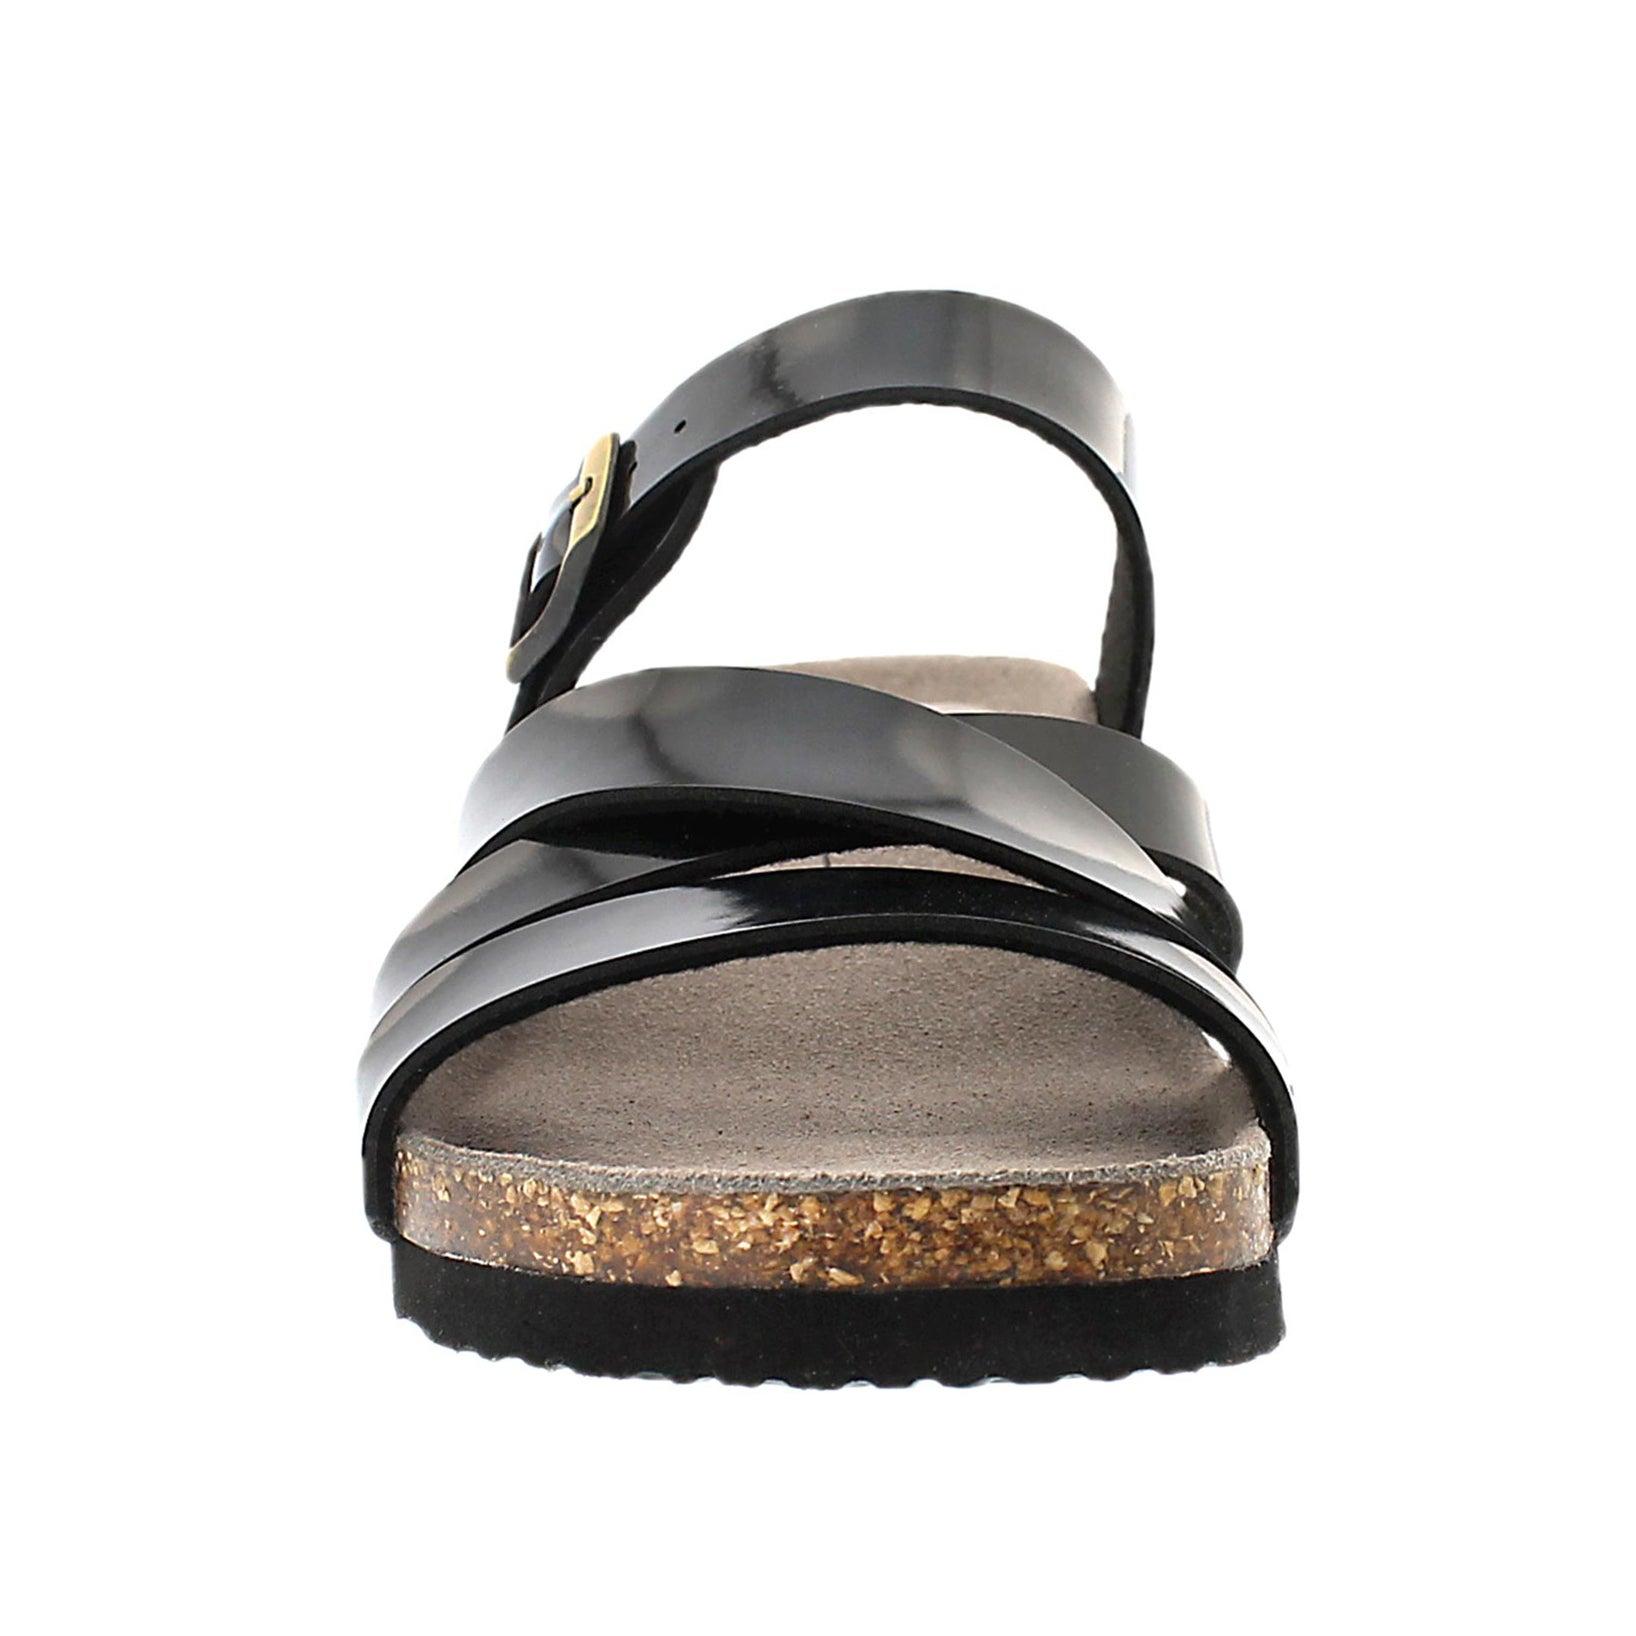 Sandale msse visc GINNIE, noir vrn, fem